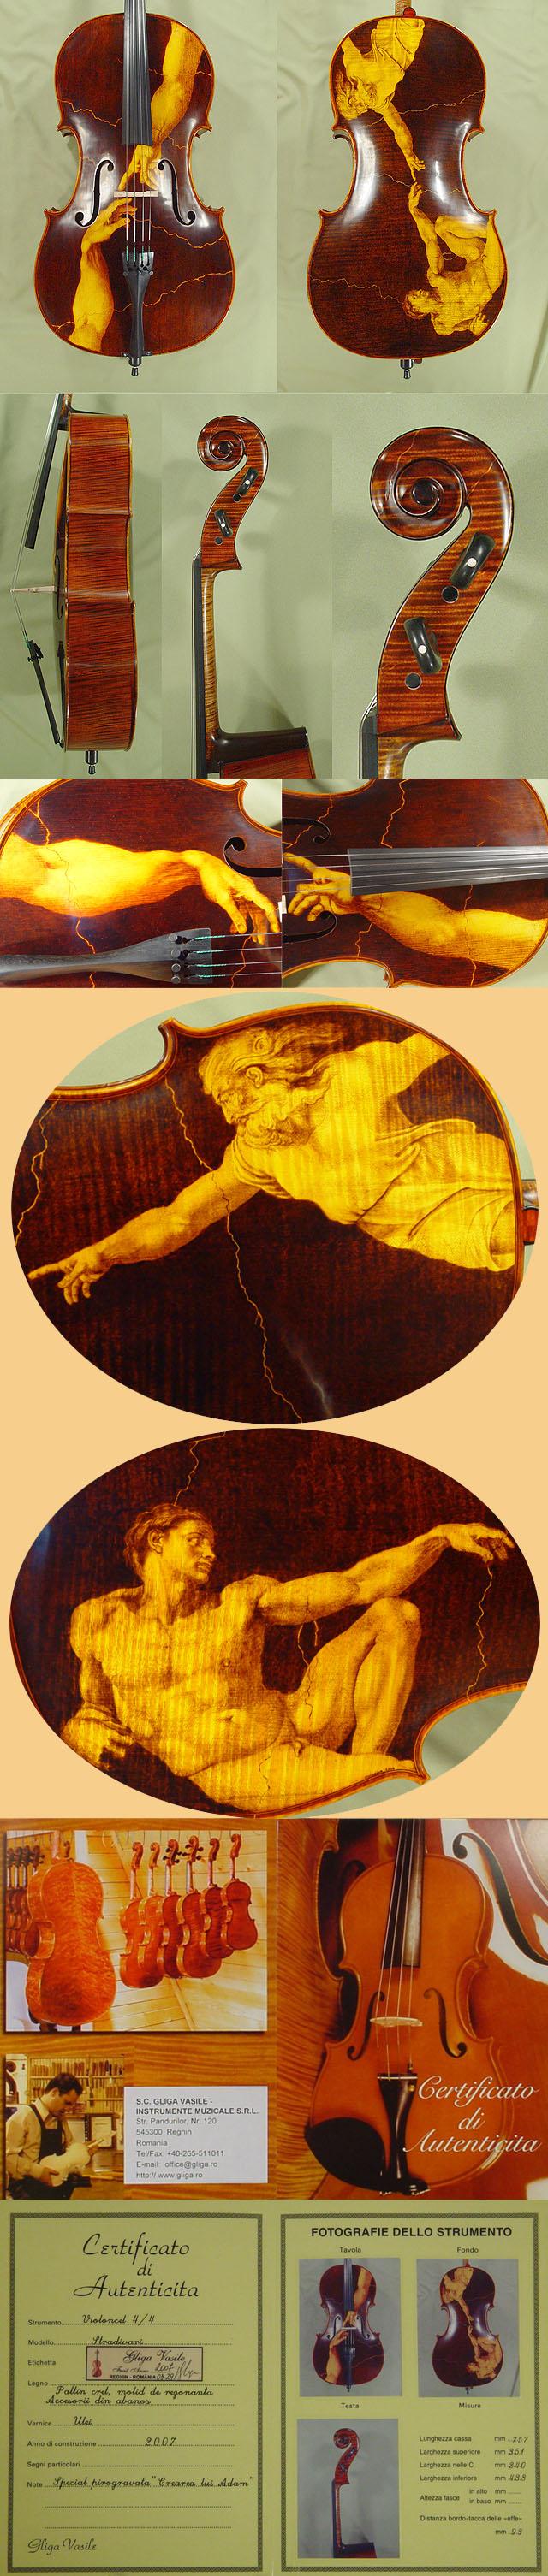 4/4 MAESTRO VASILE GLIGA 'THE CREATION of ADAM' Pyrogravure Cello